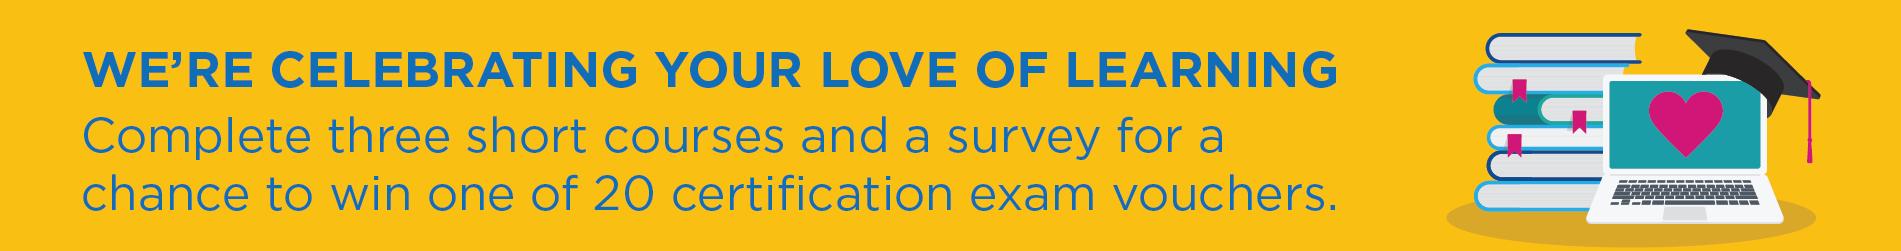 Blue Prism University Love Learning Promotion